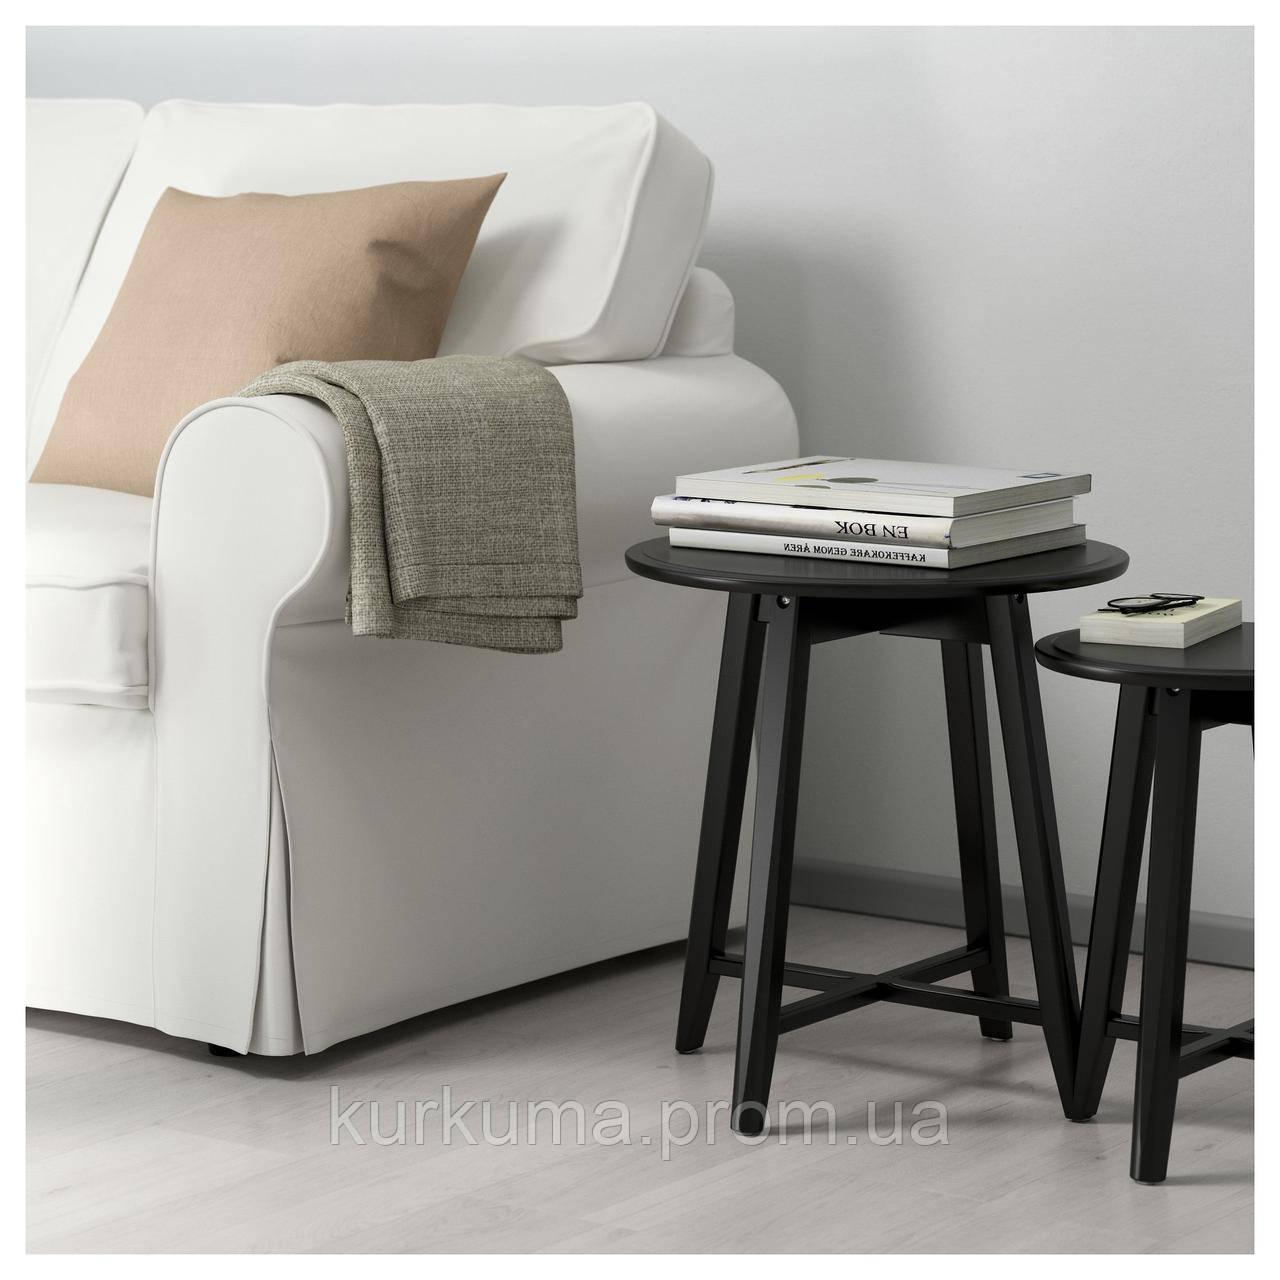 IKEA KRAGSTA Стол 2 шт., черный  (002.998.25)